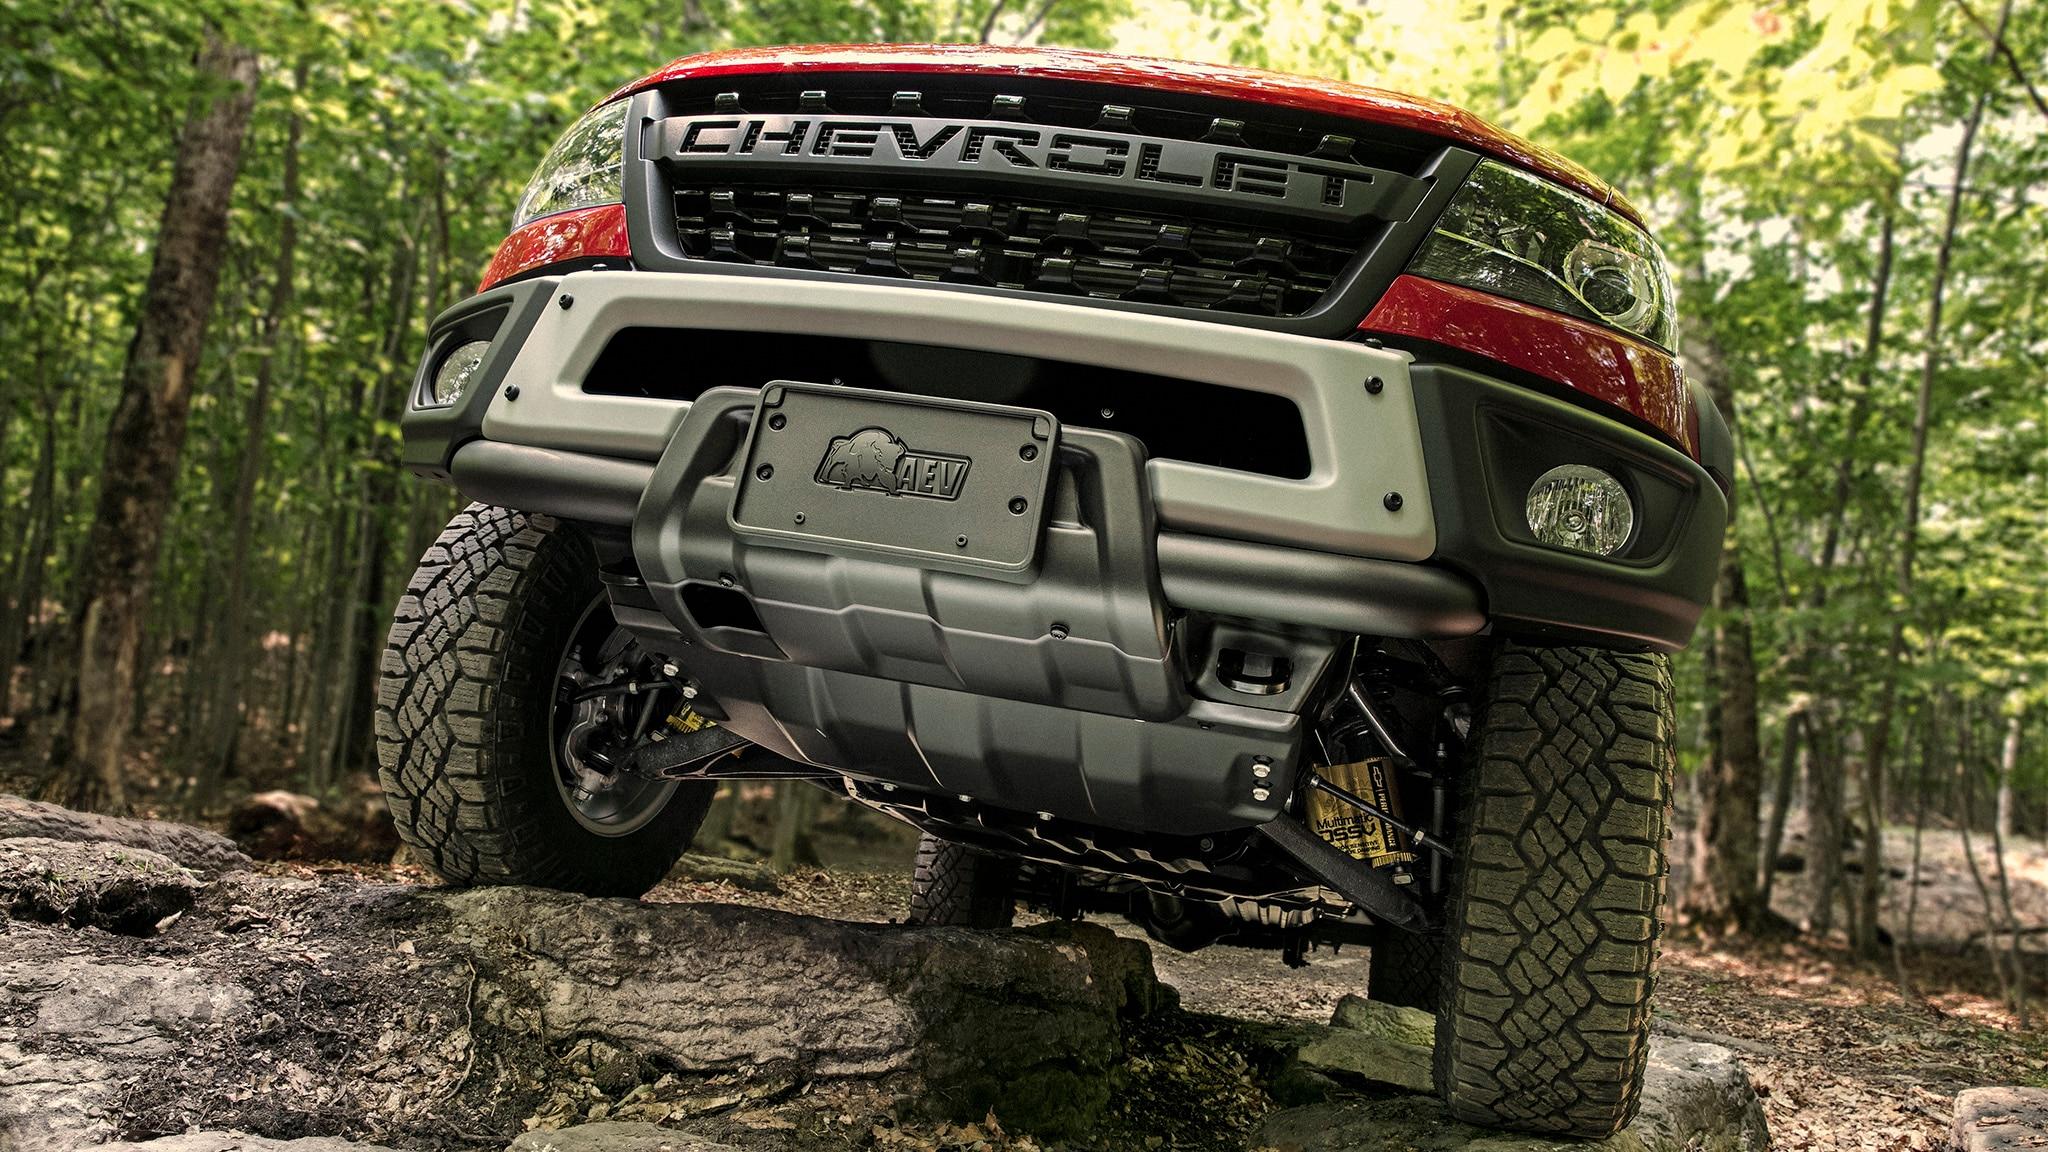 2019 Chevrolet Colorado ZR2 Bison Revealed | Automobile ...